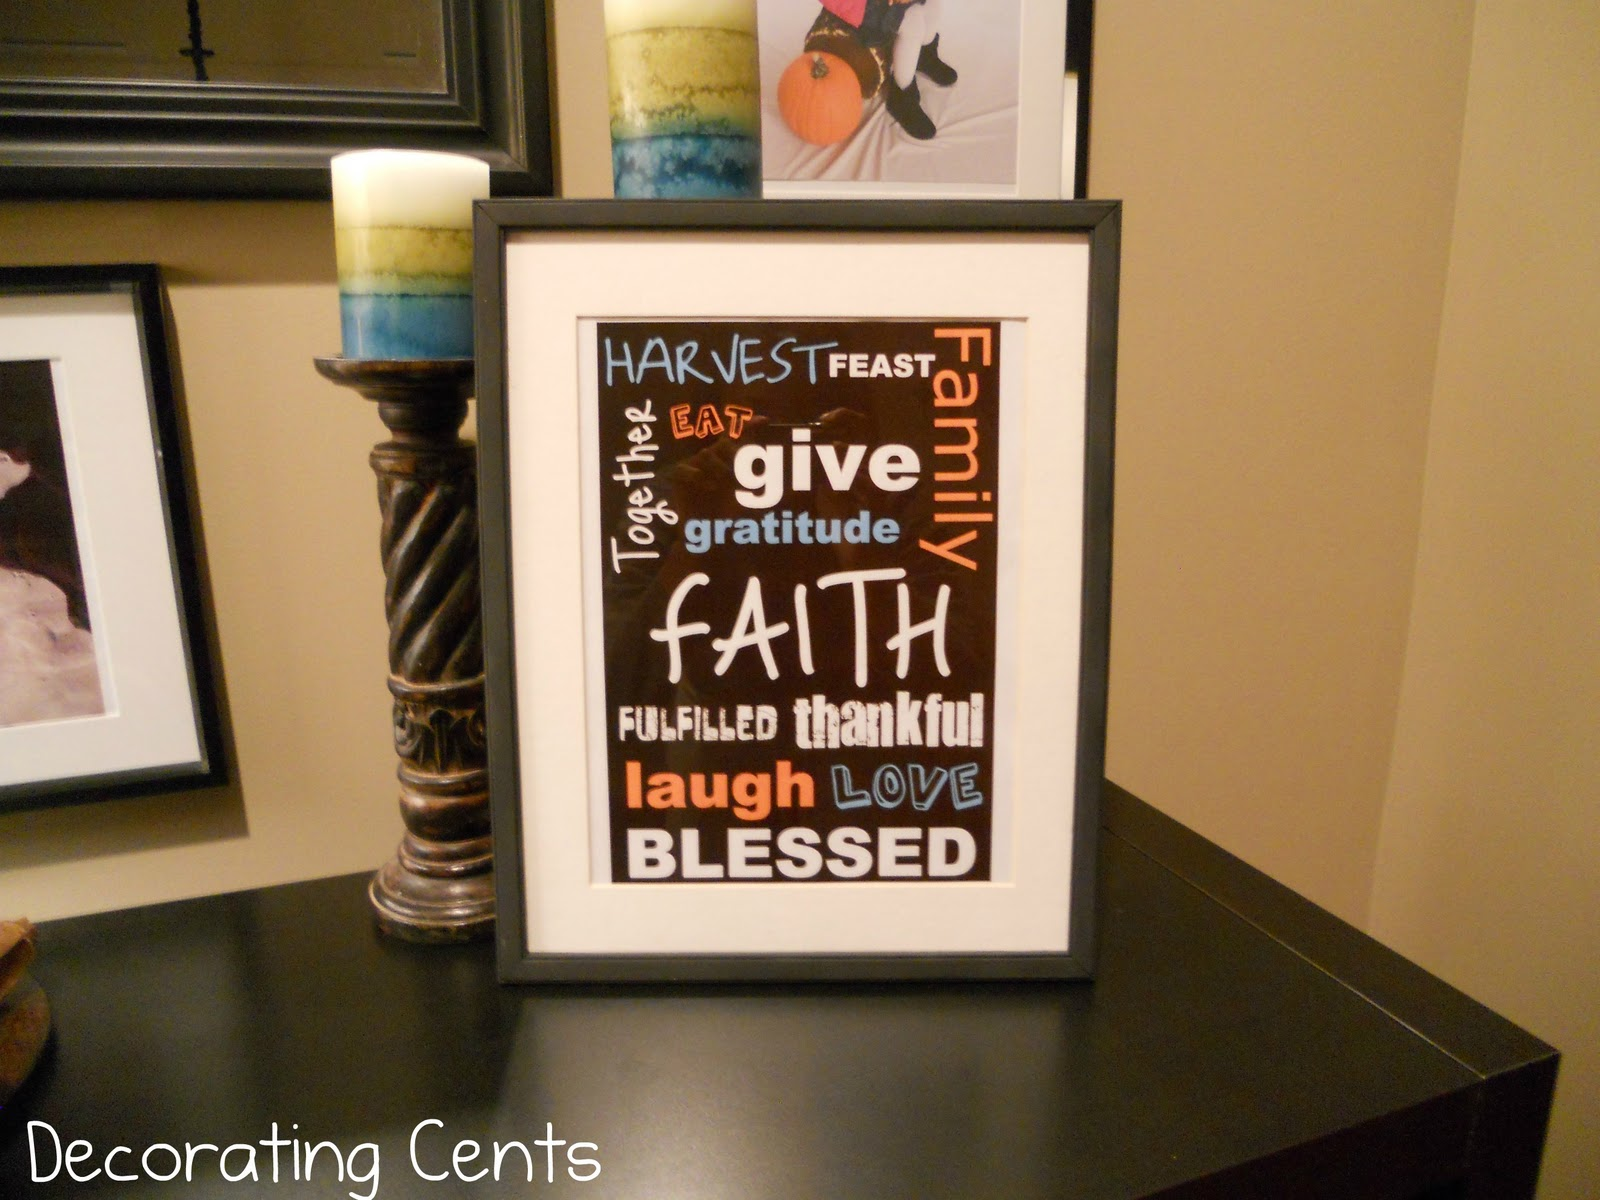 Decorating Cents: November 2011